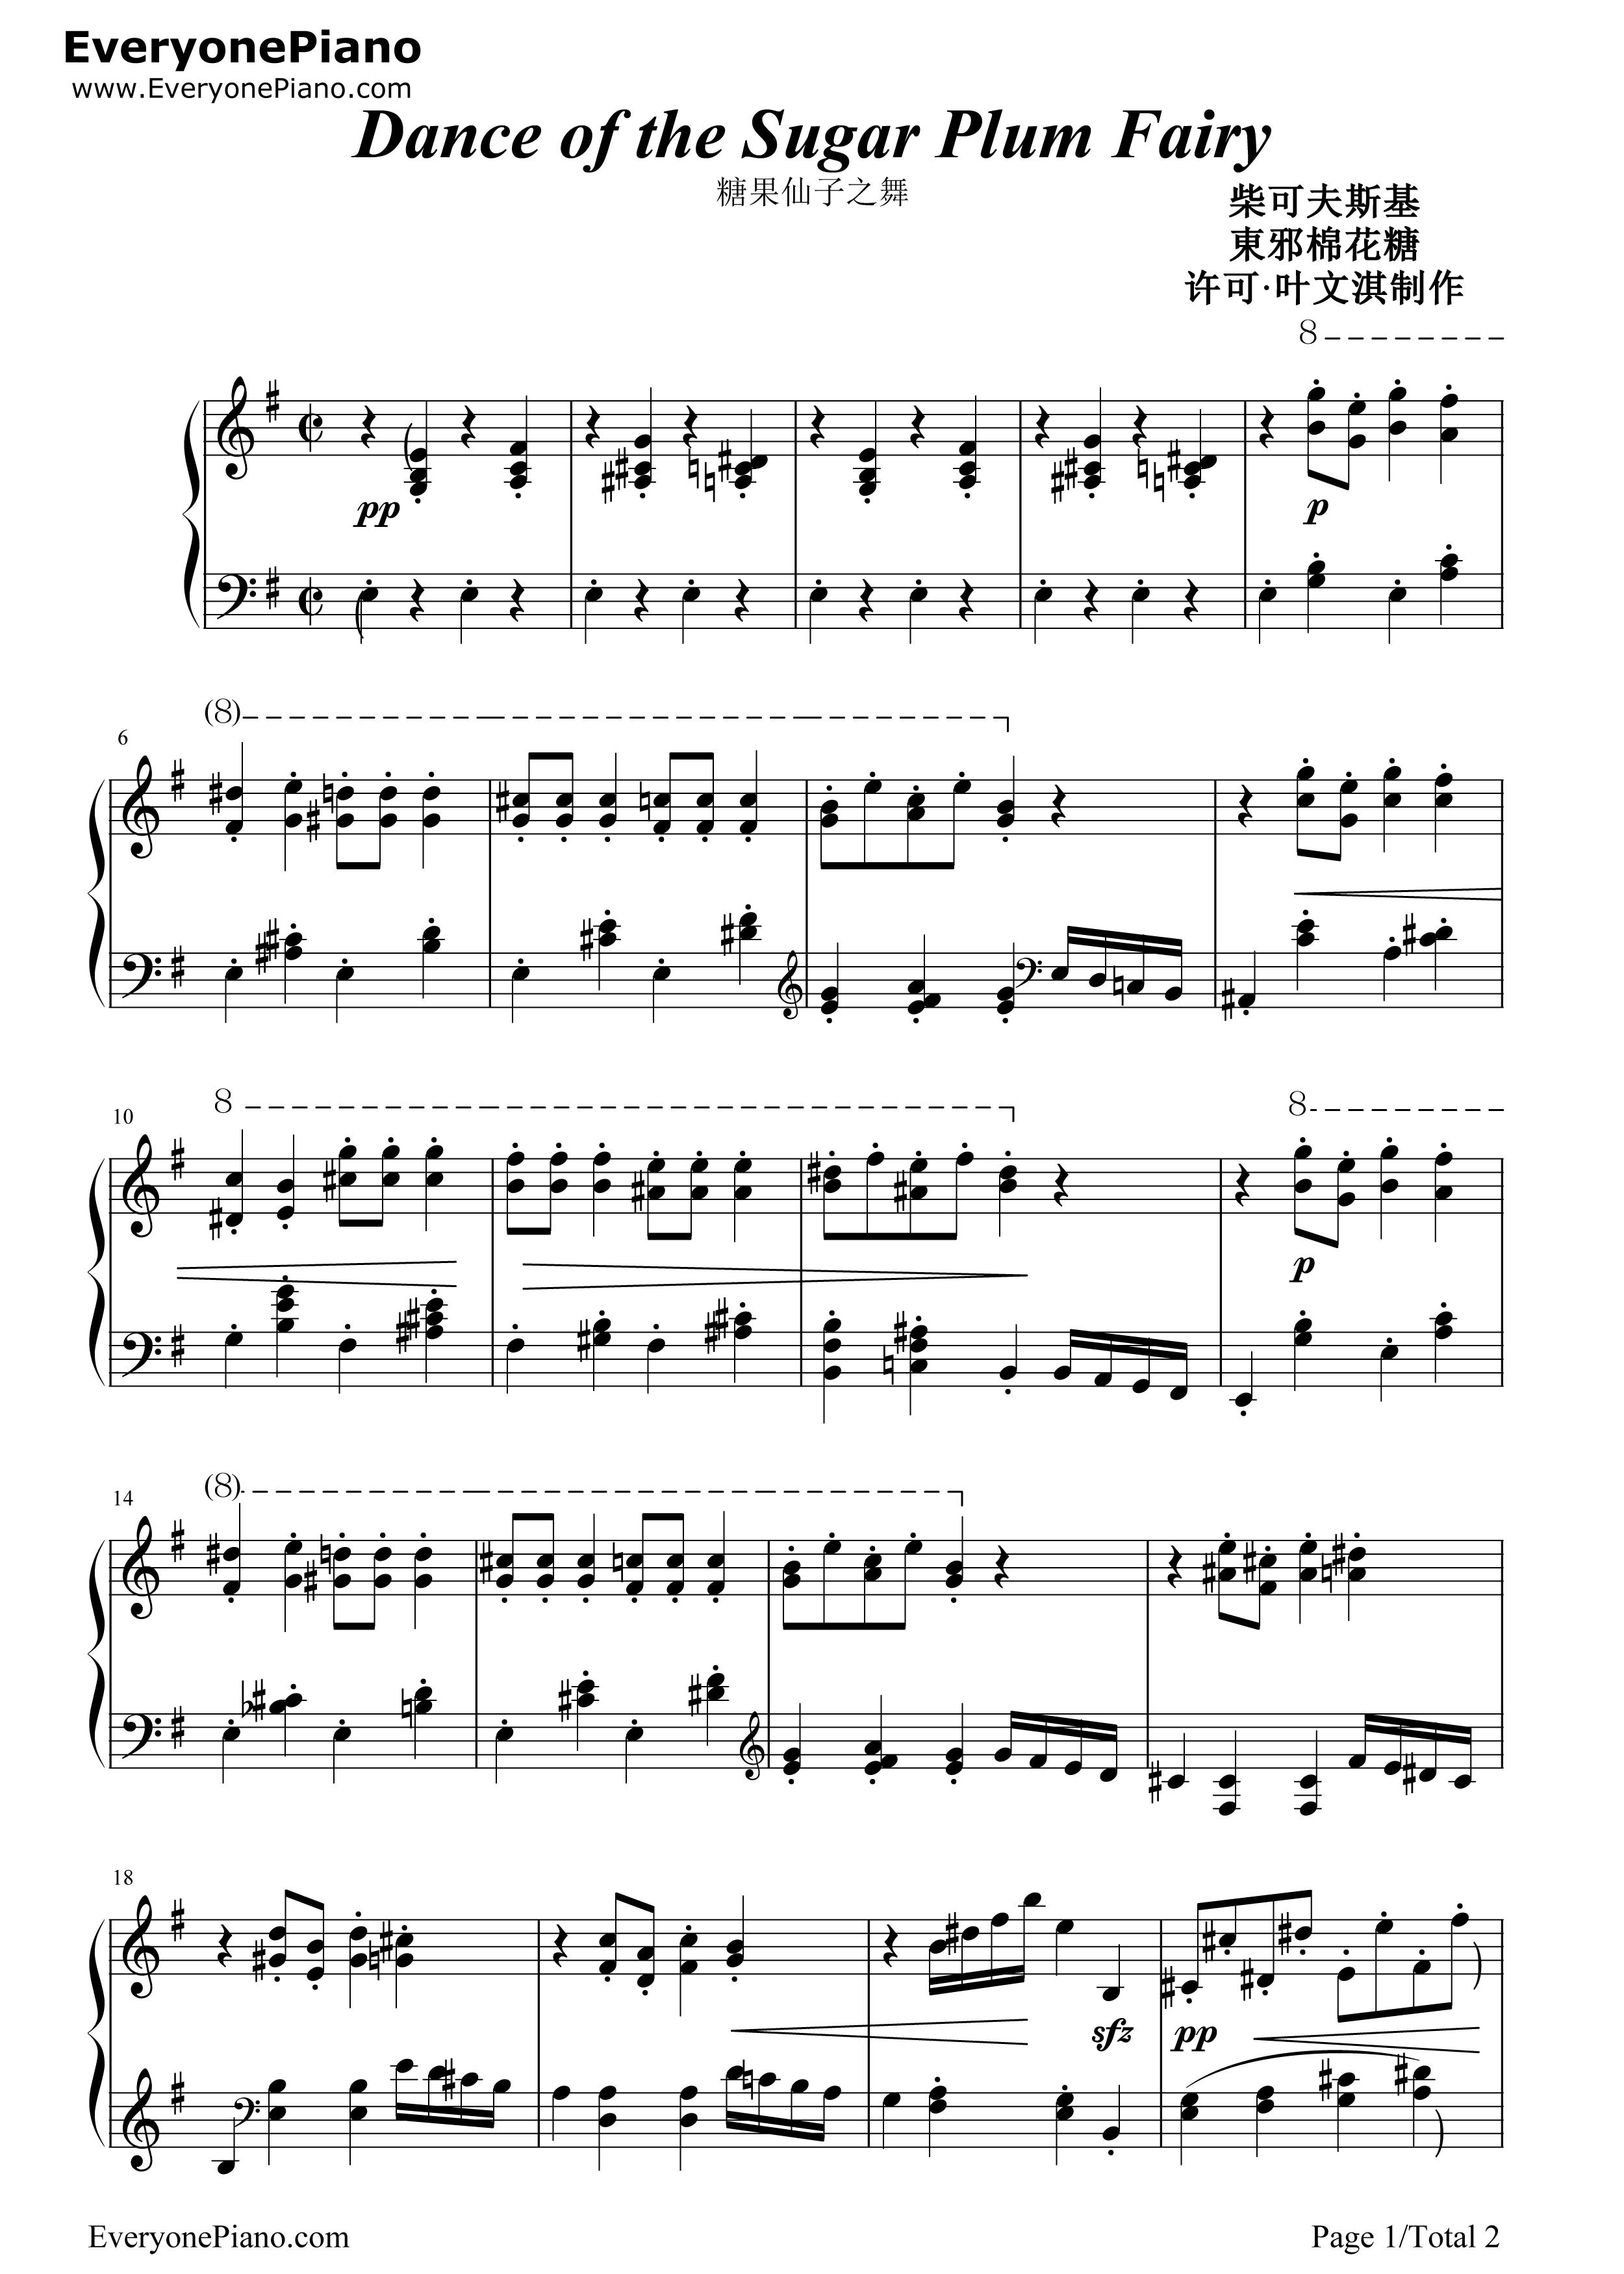 dance of the sugar plum fairy sheet music piano pdf